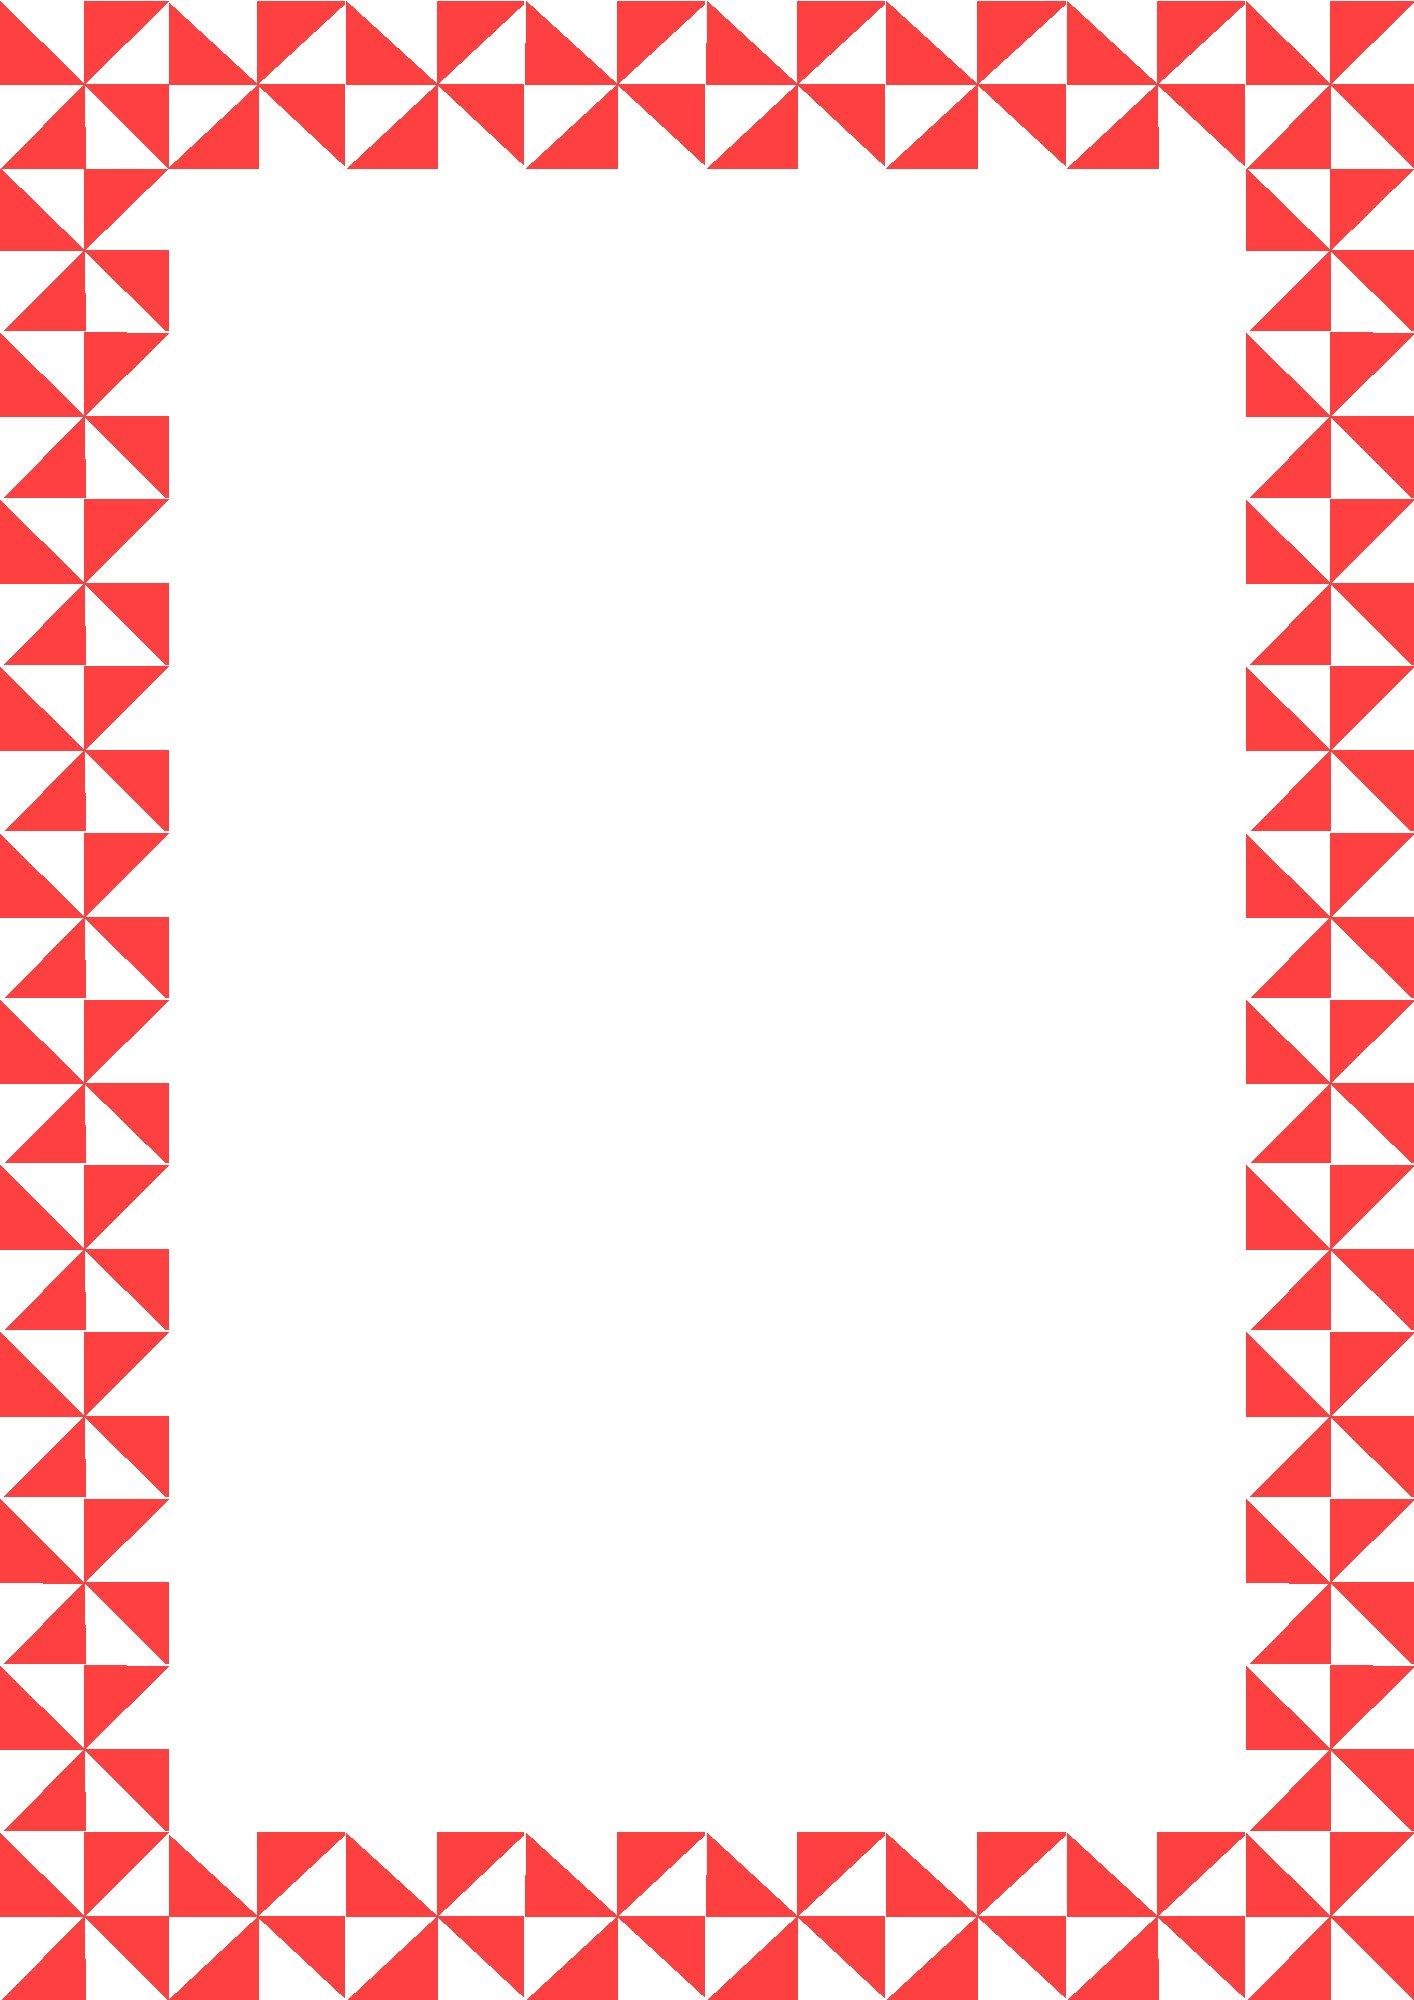 Clip Art Borders And Frames Clipart - Clipart Kid